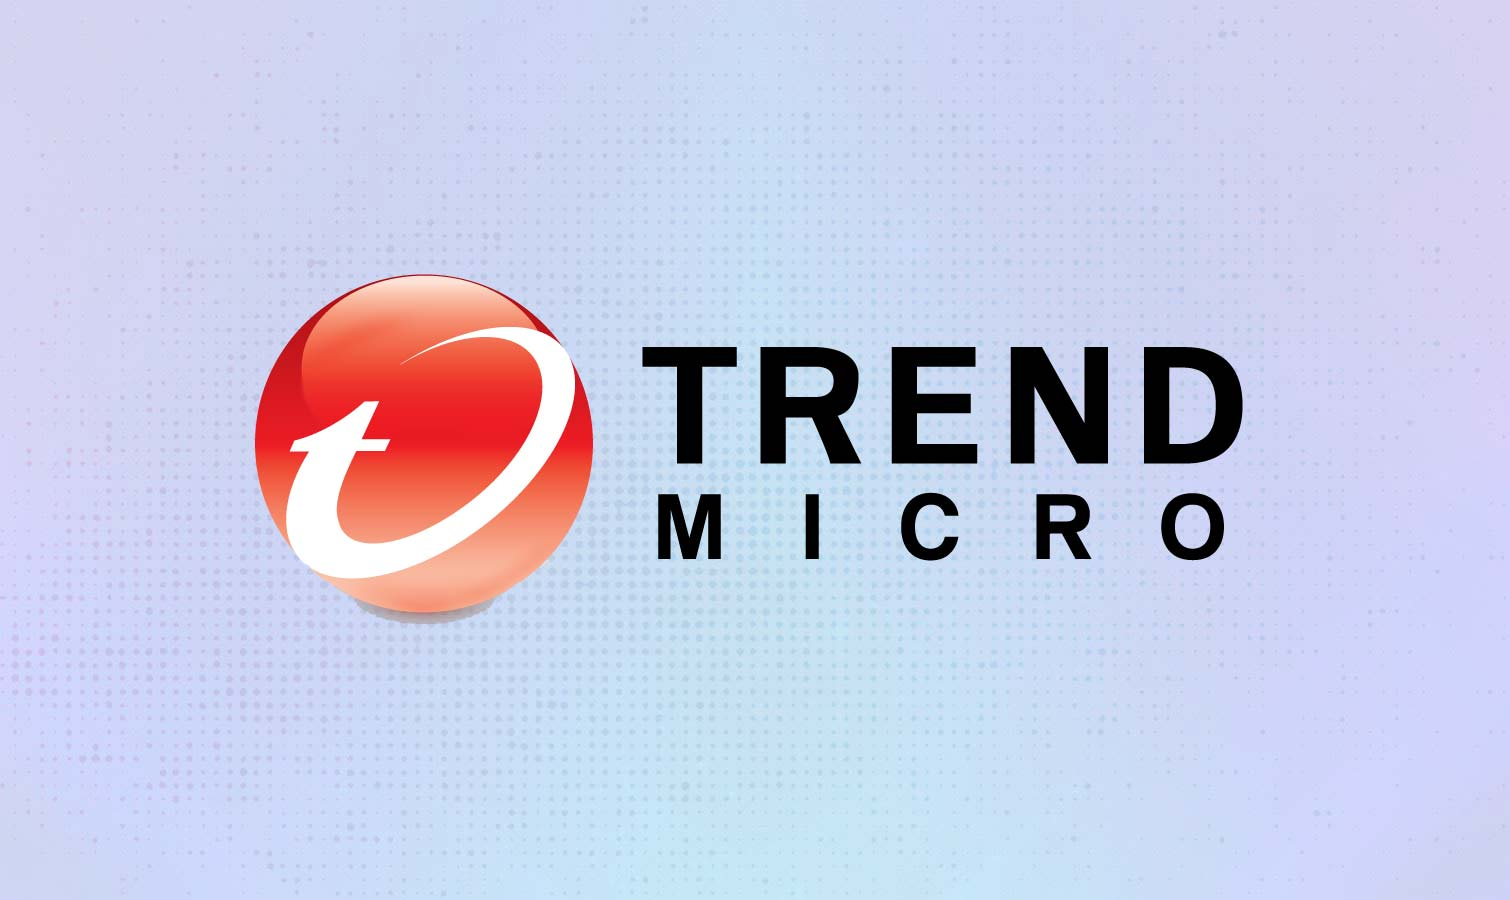 Trend Micro 2019 Review - Trend Micro Antivirus+, Trend Micro